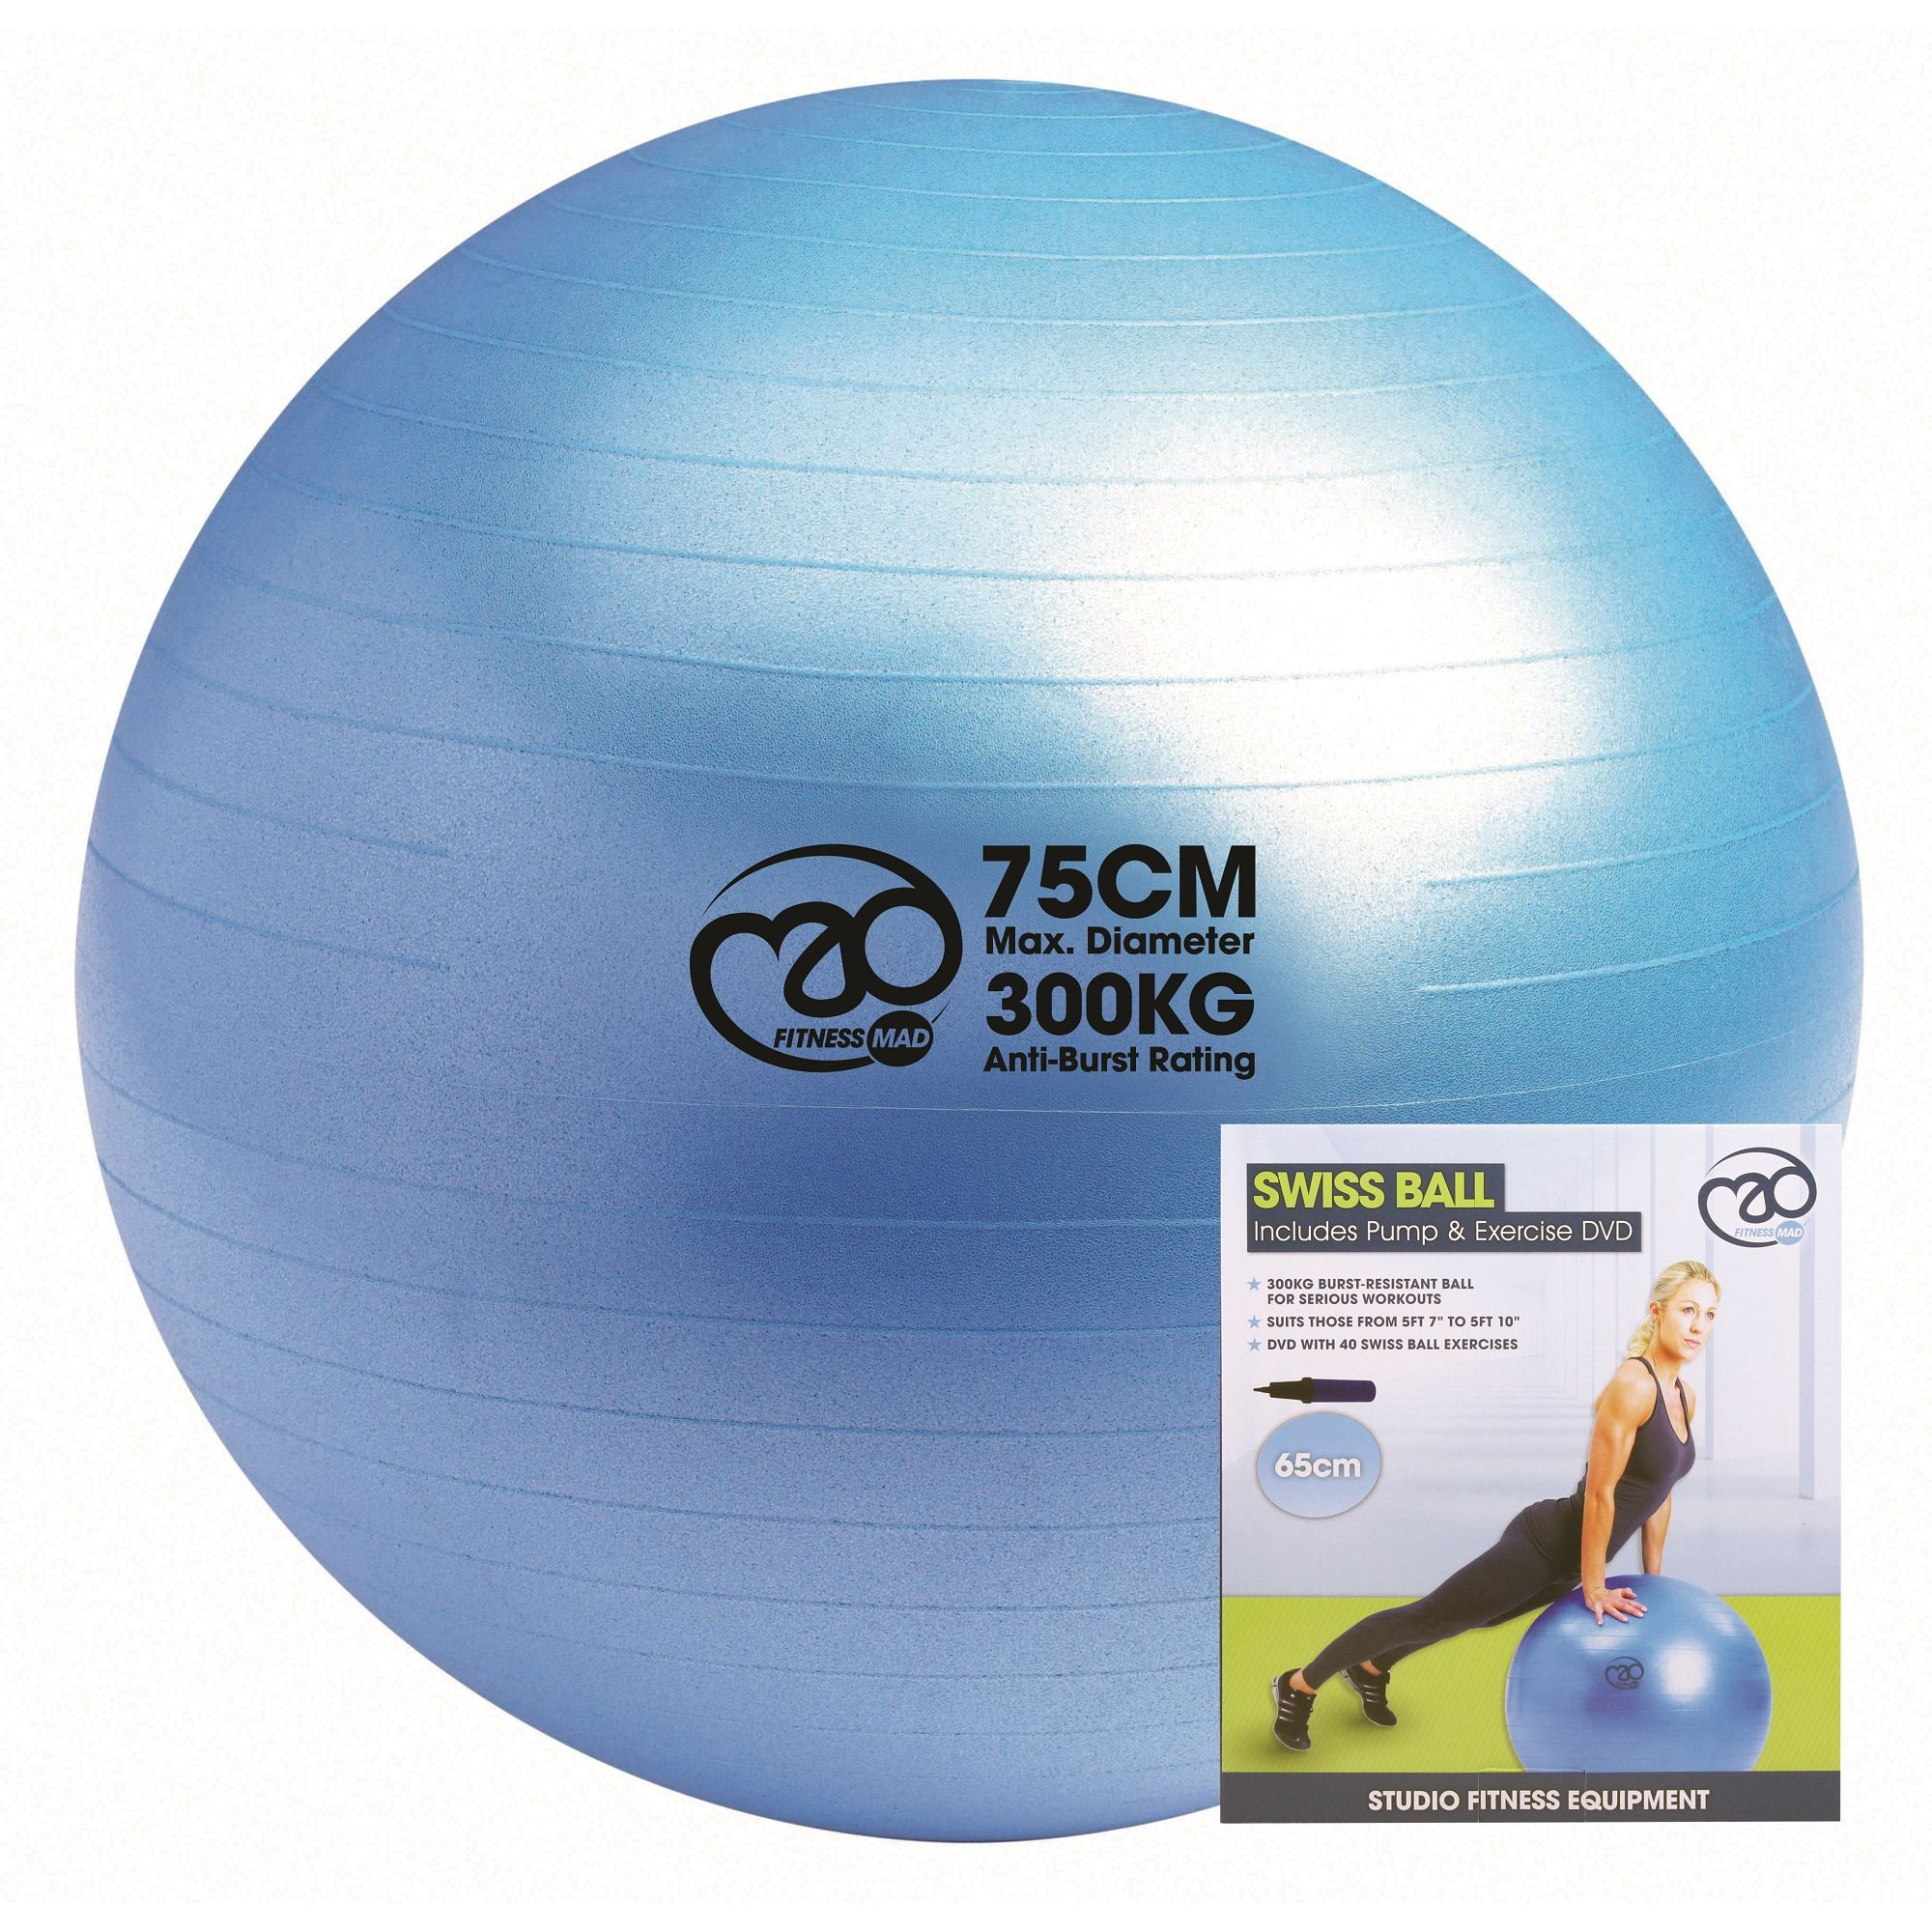 Balance Ball Dvd: Fitness Mad Swiss Ball 300kg, Pump And DVD